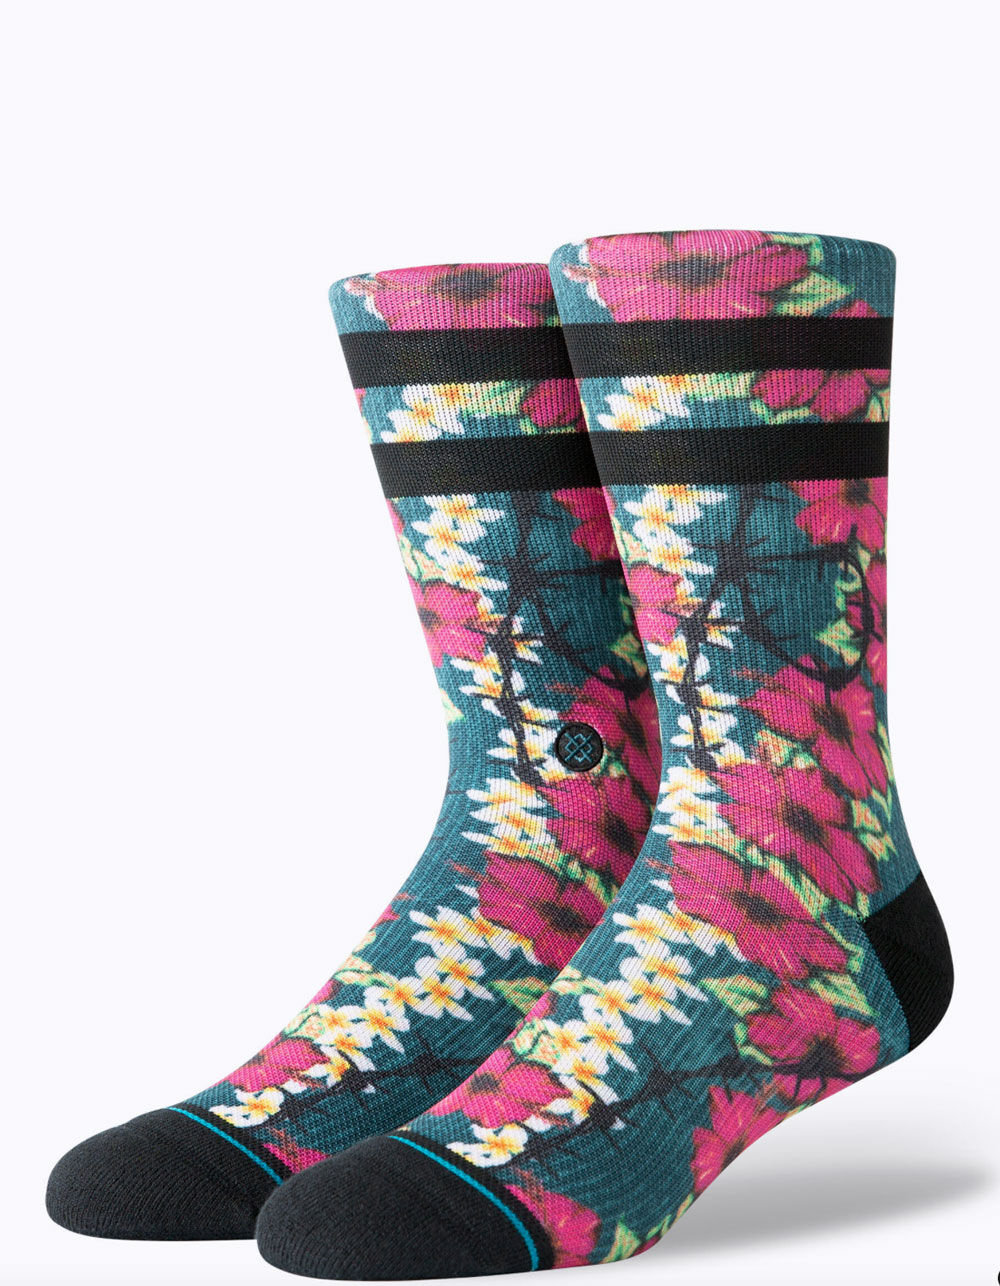 STANCE Barrier Reef Crew Socks